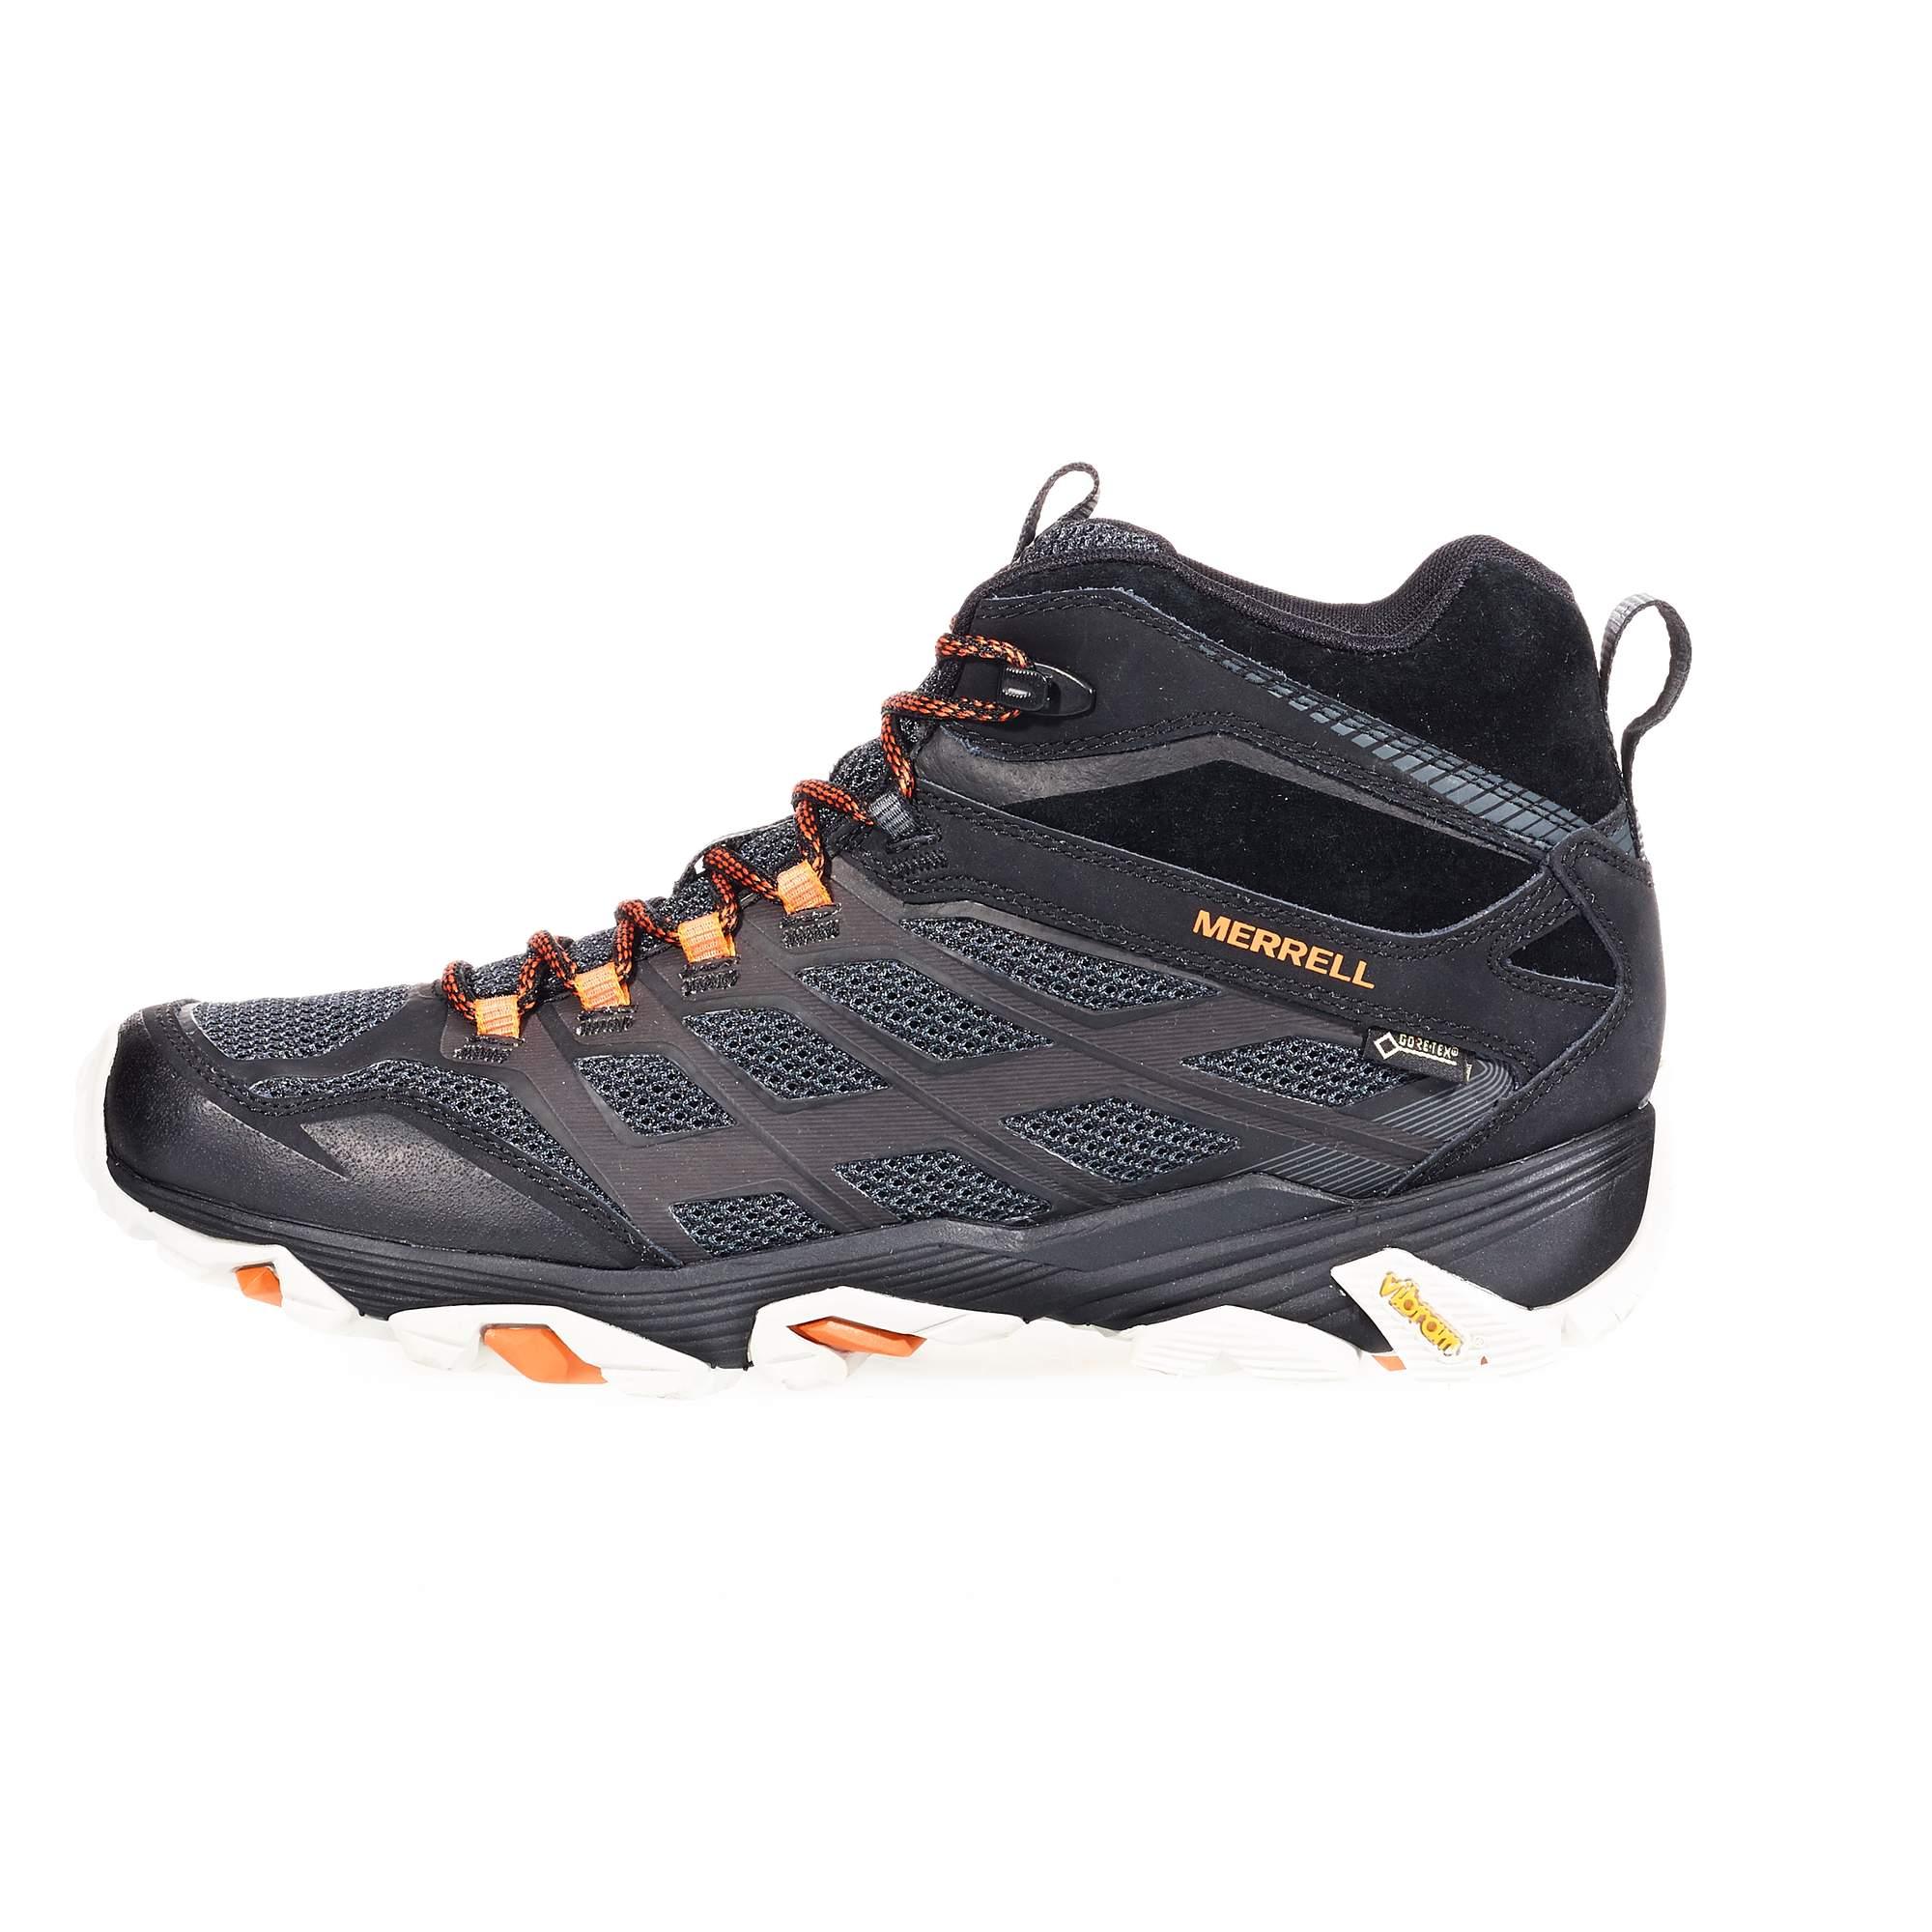 Merrell Moab FST Mid GTX Damen - grau - Sportliche Hikingstiefel osOpjZ